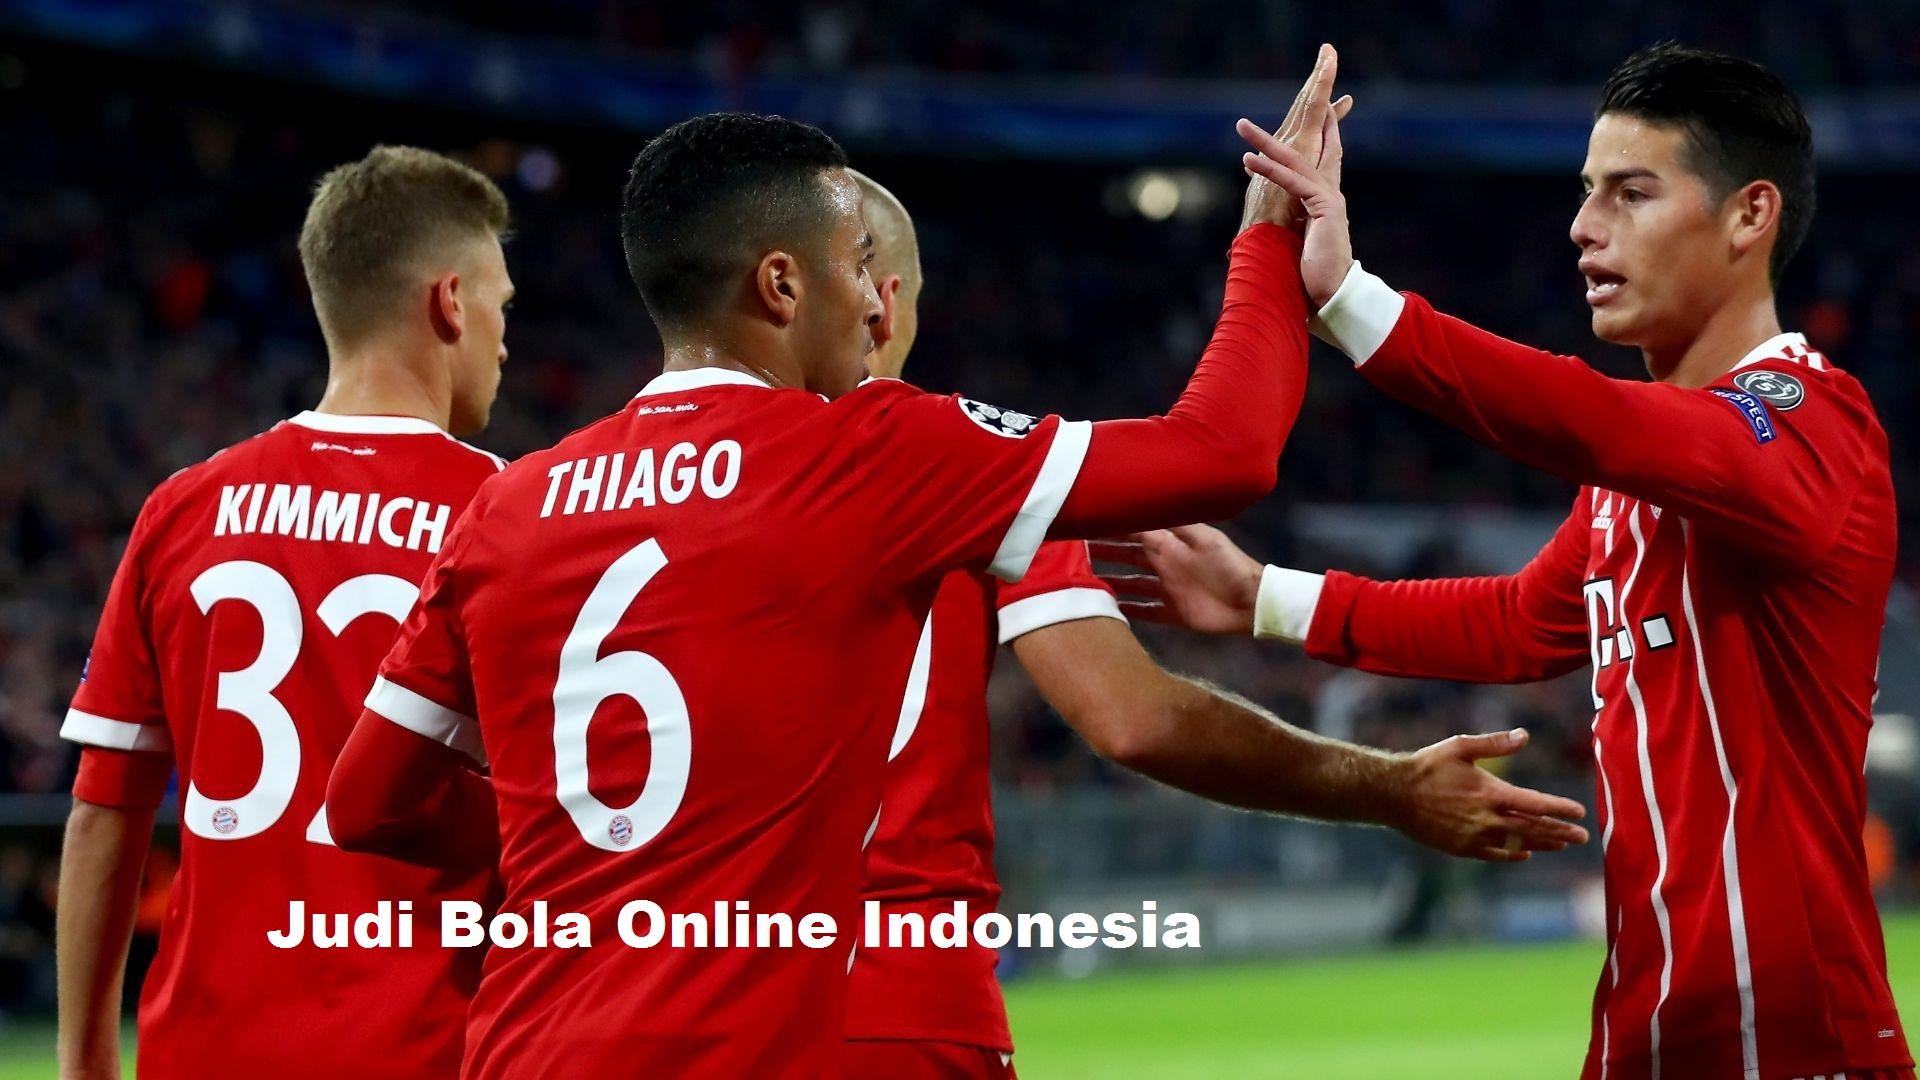 Game Judi Bola Online Indonesia